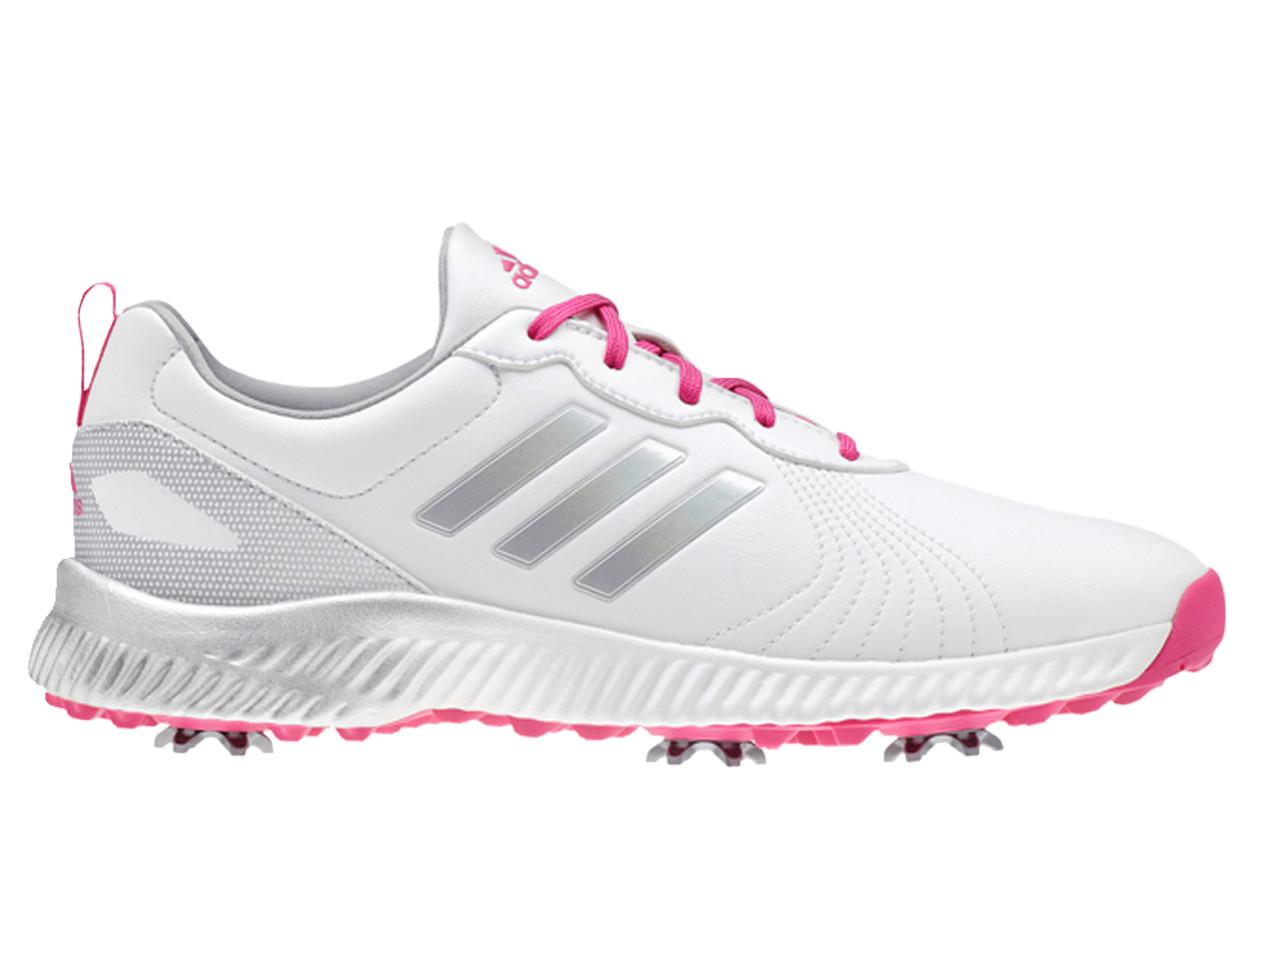 b8c6dfd87996e Adidas Ladies Response Bounce Golf Shoes - White Magenta F18 ...